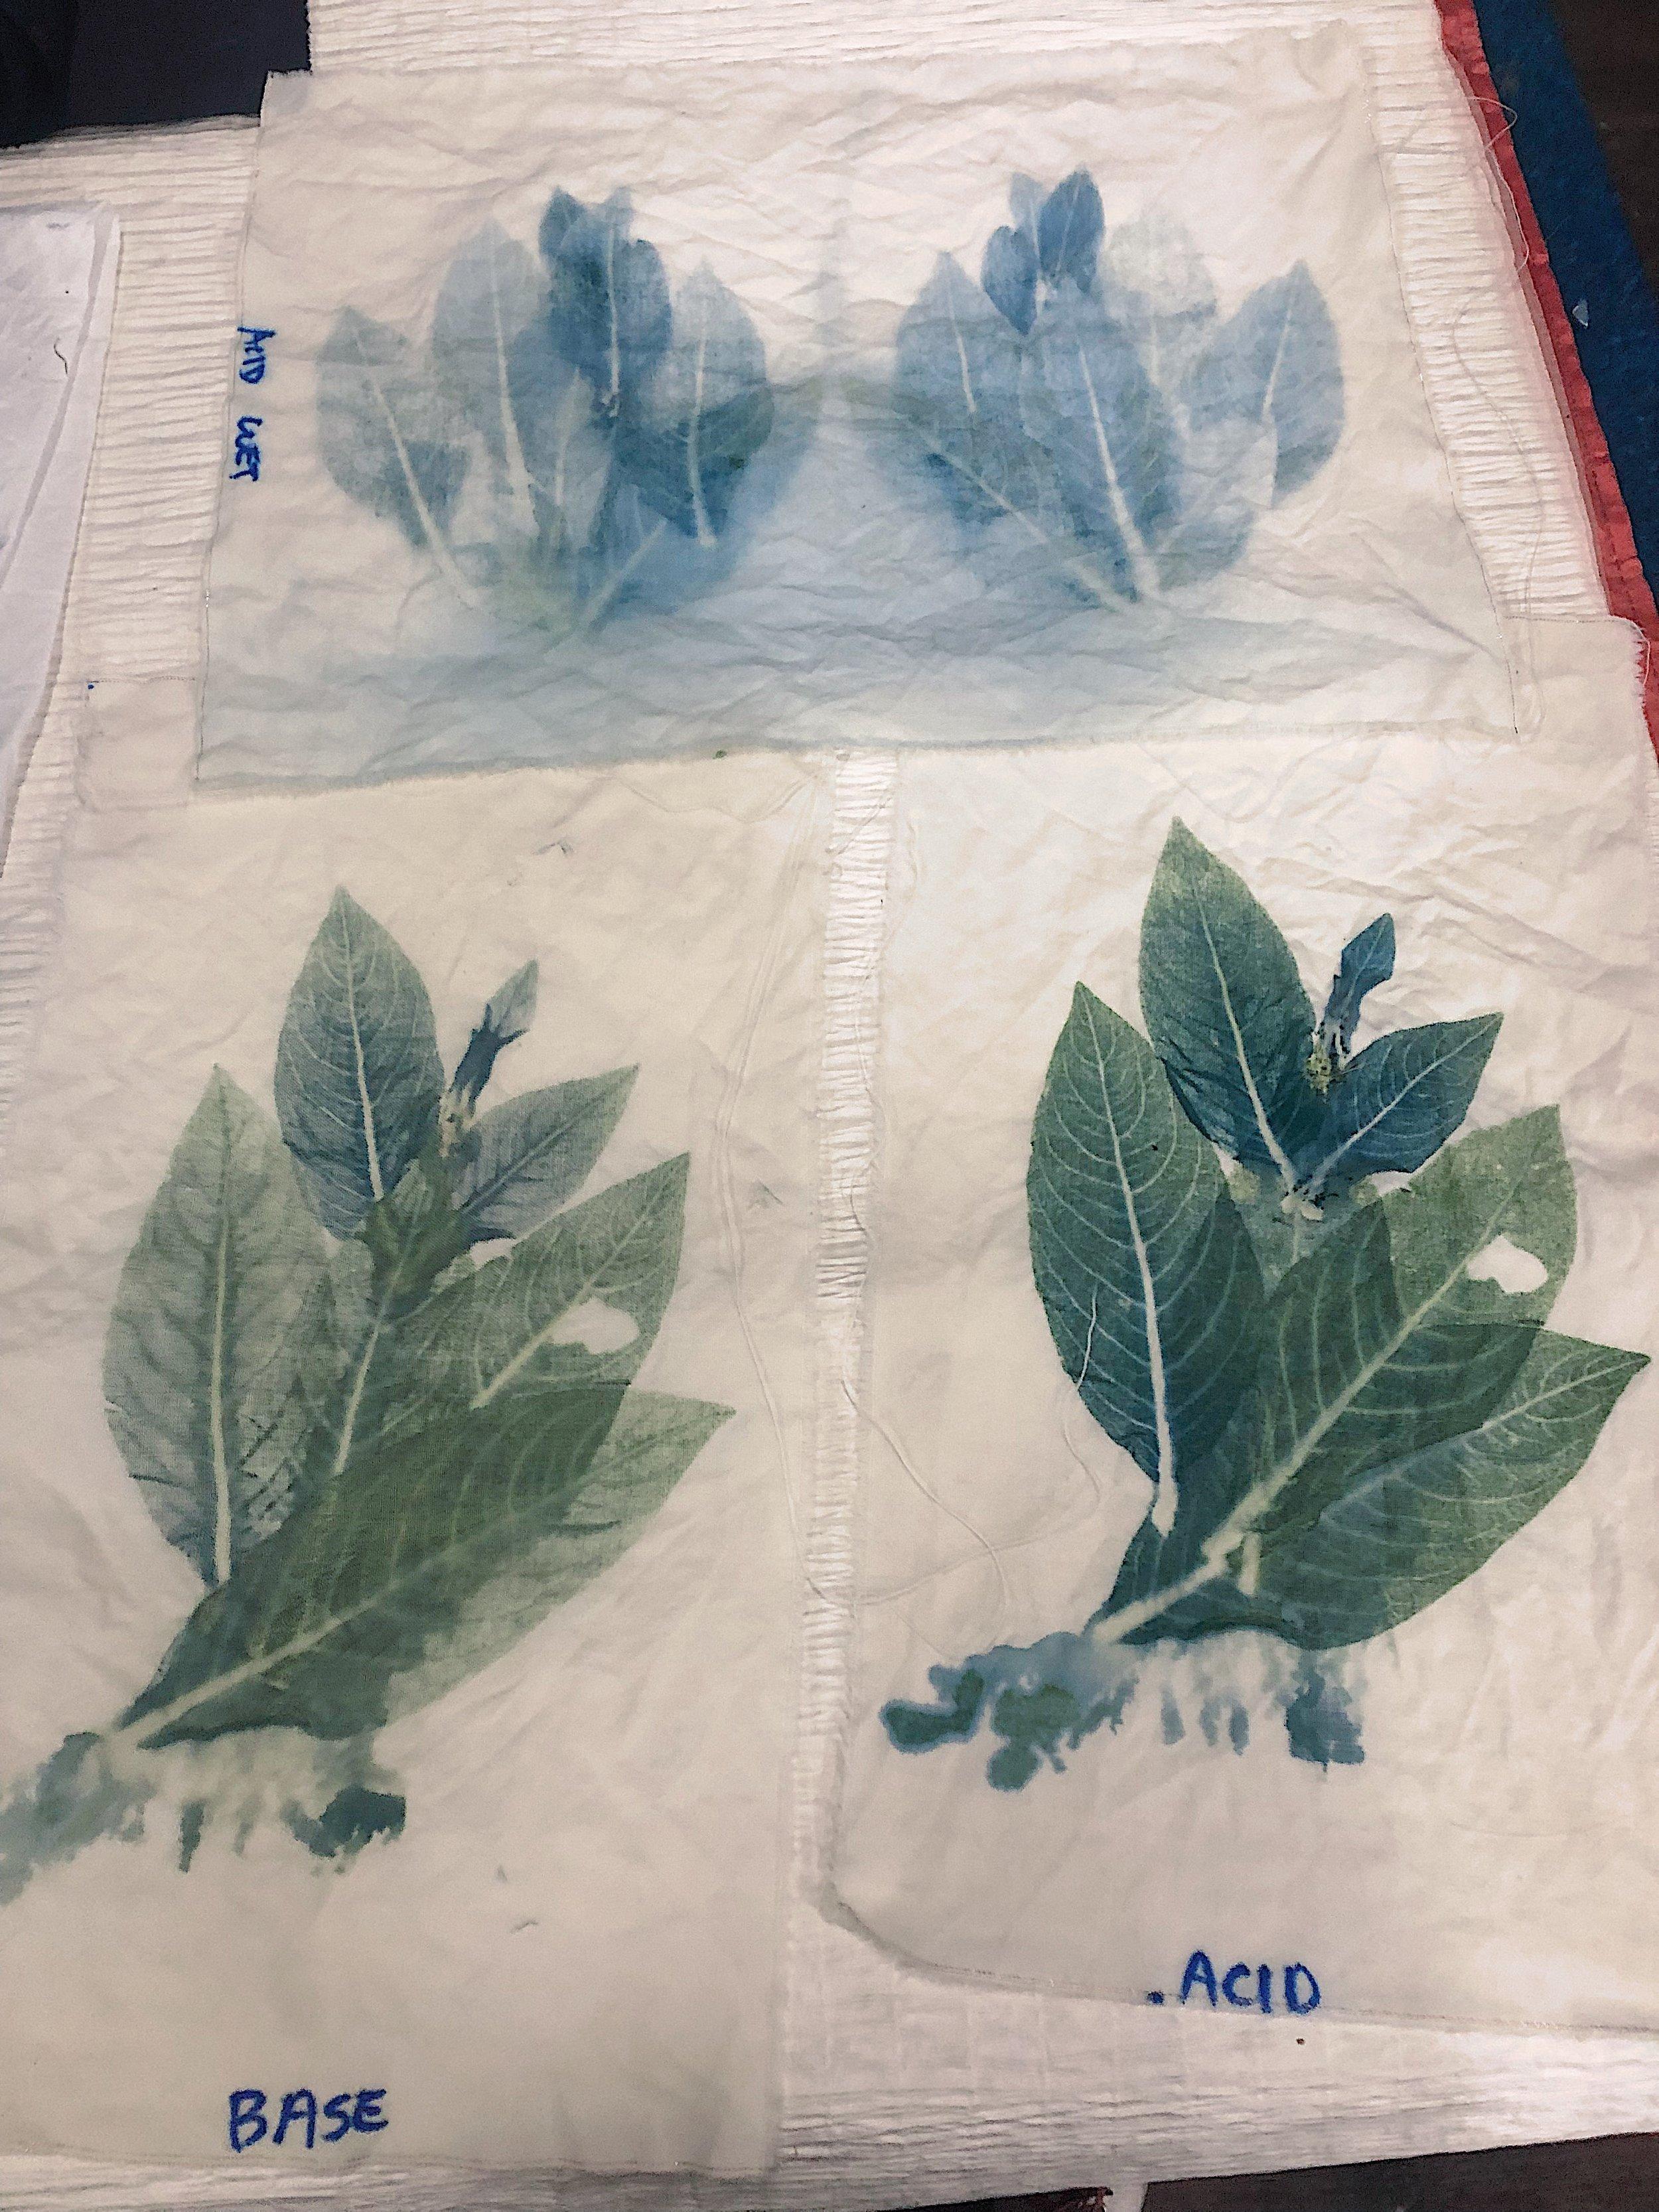 John's indigo leaf prints using pH modifications